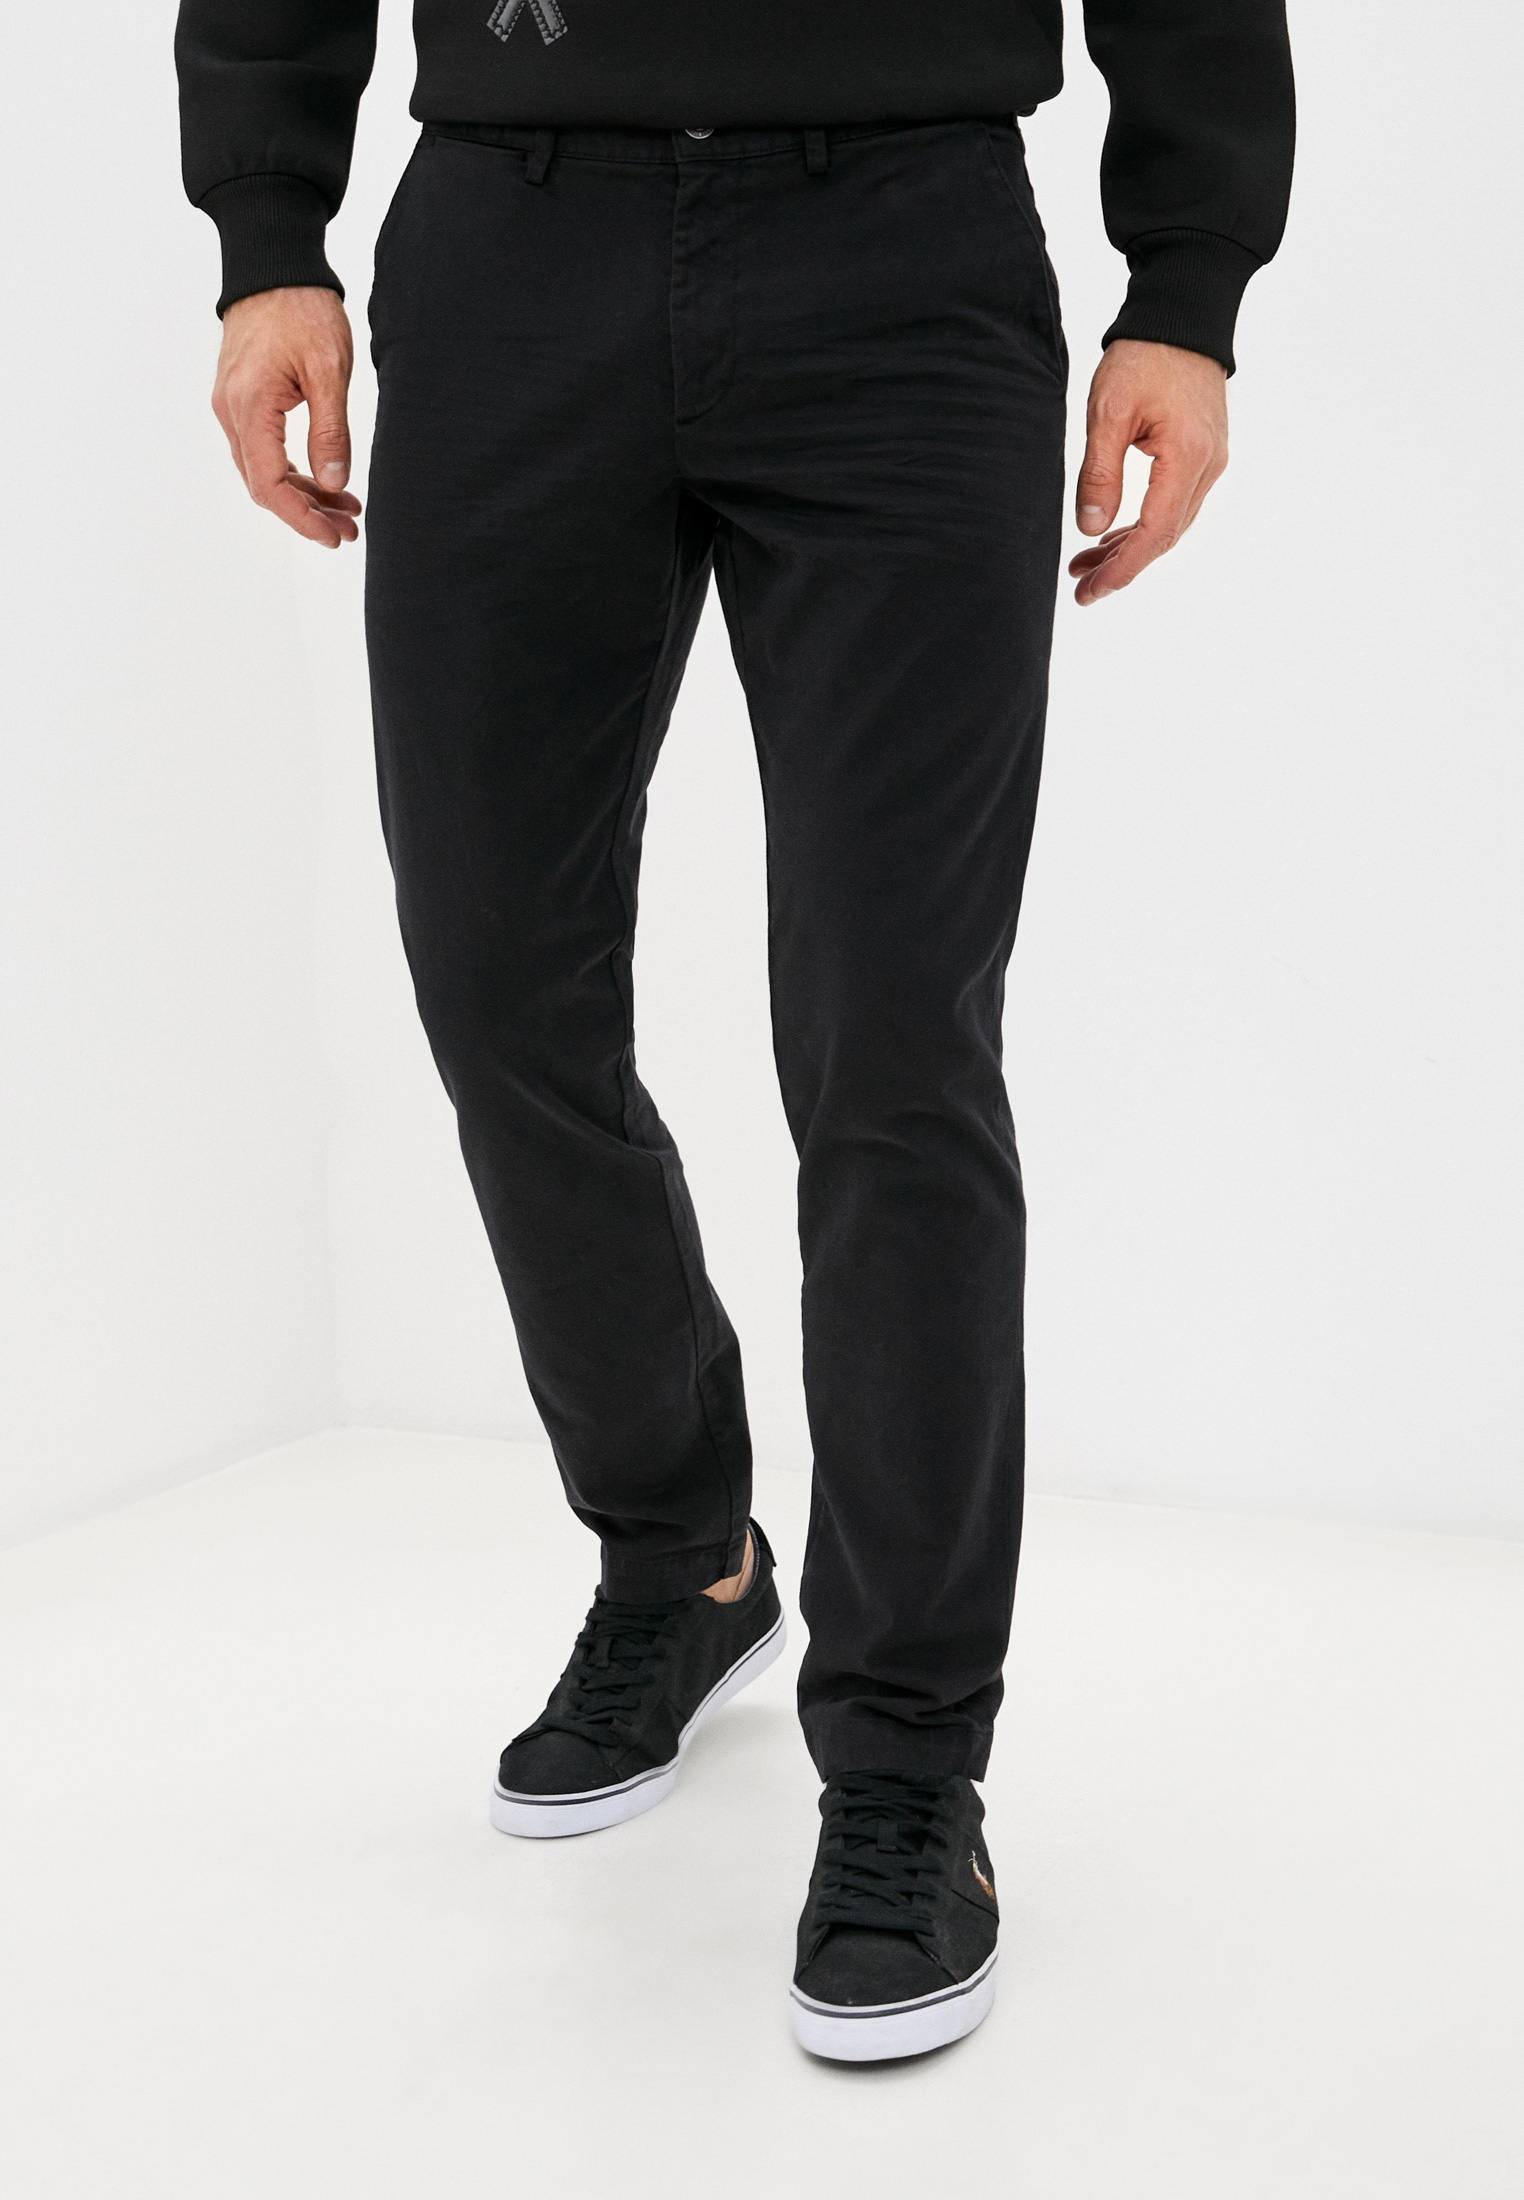 Мужские повседневные брюки Bikkembergs (Биккембергс) C P 001 15 S 3279